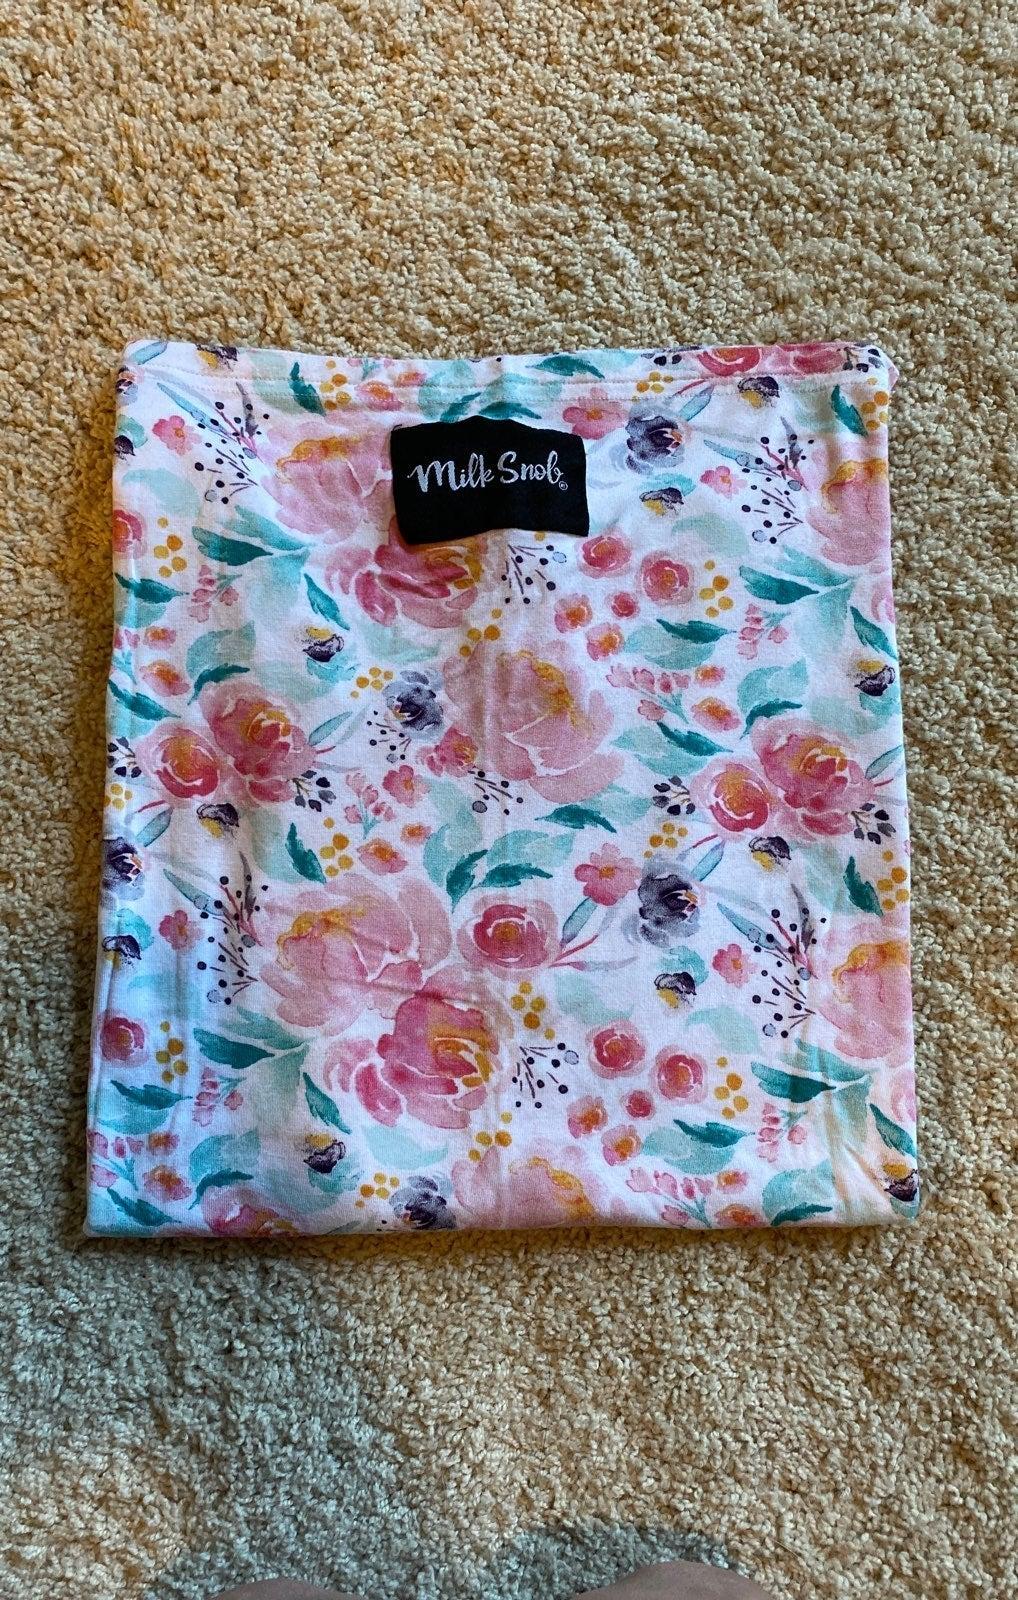 Milk Snob carseat nursing cover pink flo